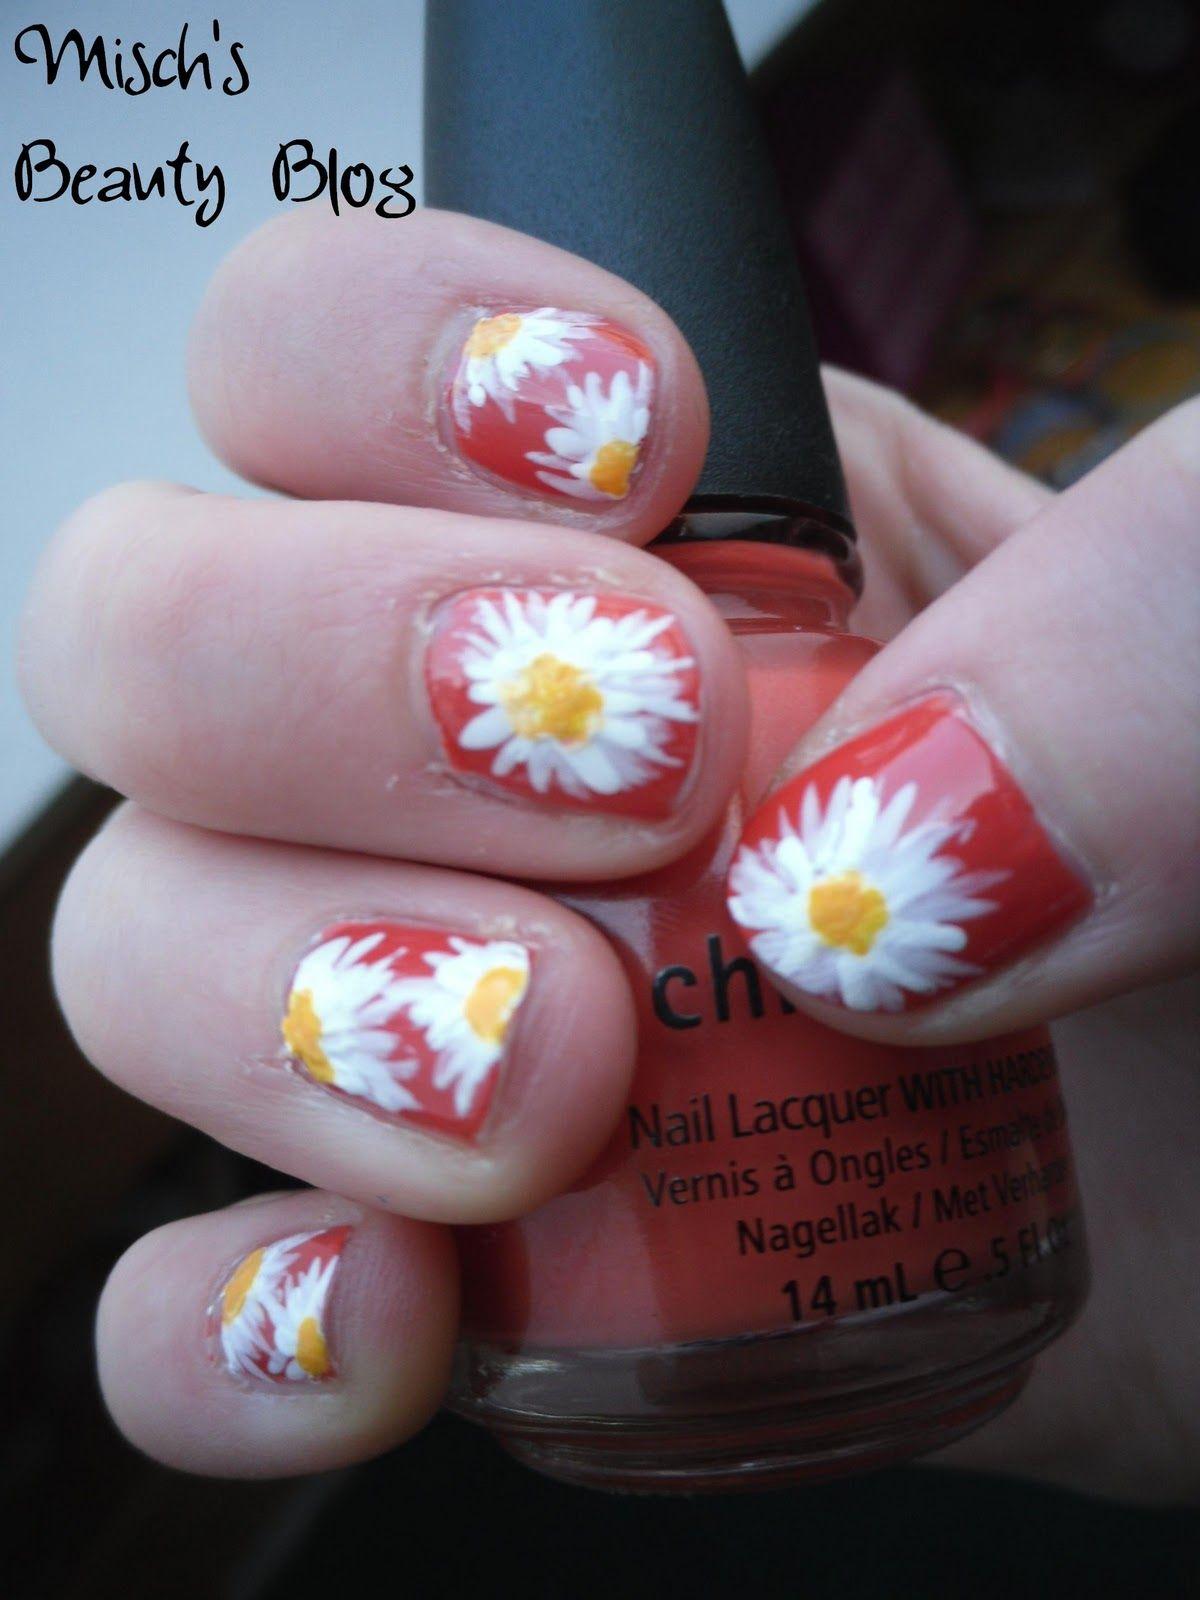 march nail art   Misch\'s Beauty Blog: NOTD March 7th: Daisy Nail Art ...